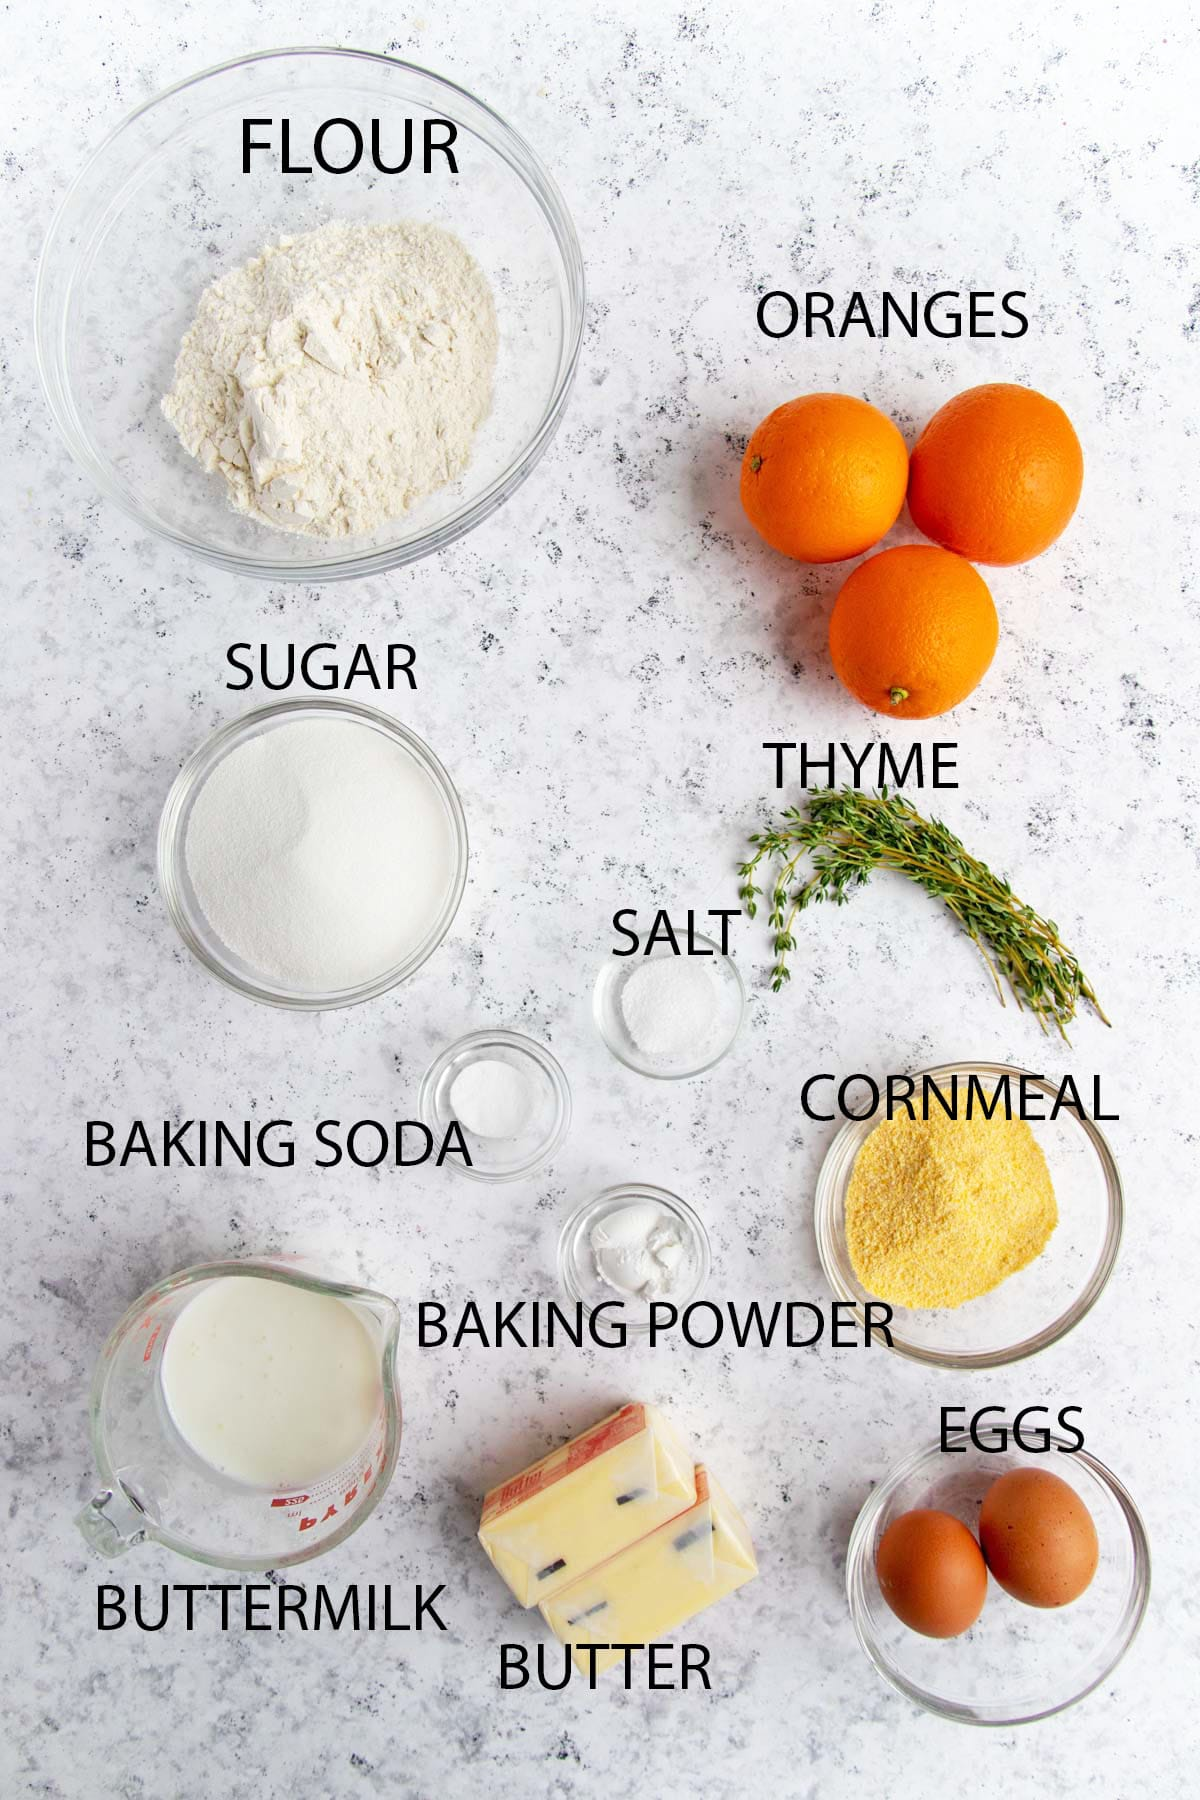 Orange upside down cake ingredients - Flour, fresh oranges, thyme, cornmeal, salt, eggs, butter, buttermilk, baking powder, baking soda, sugar